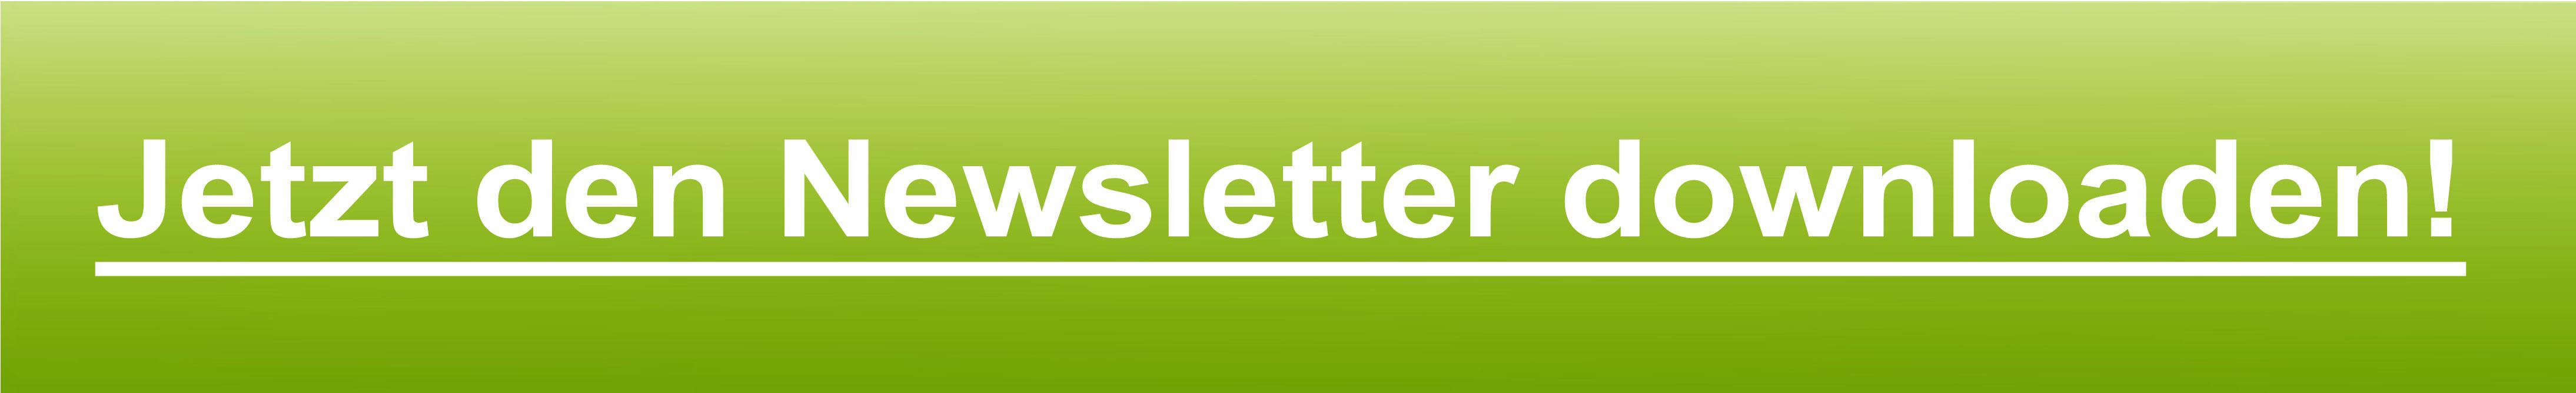 button-newsletter-download